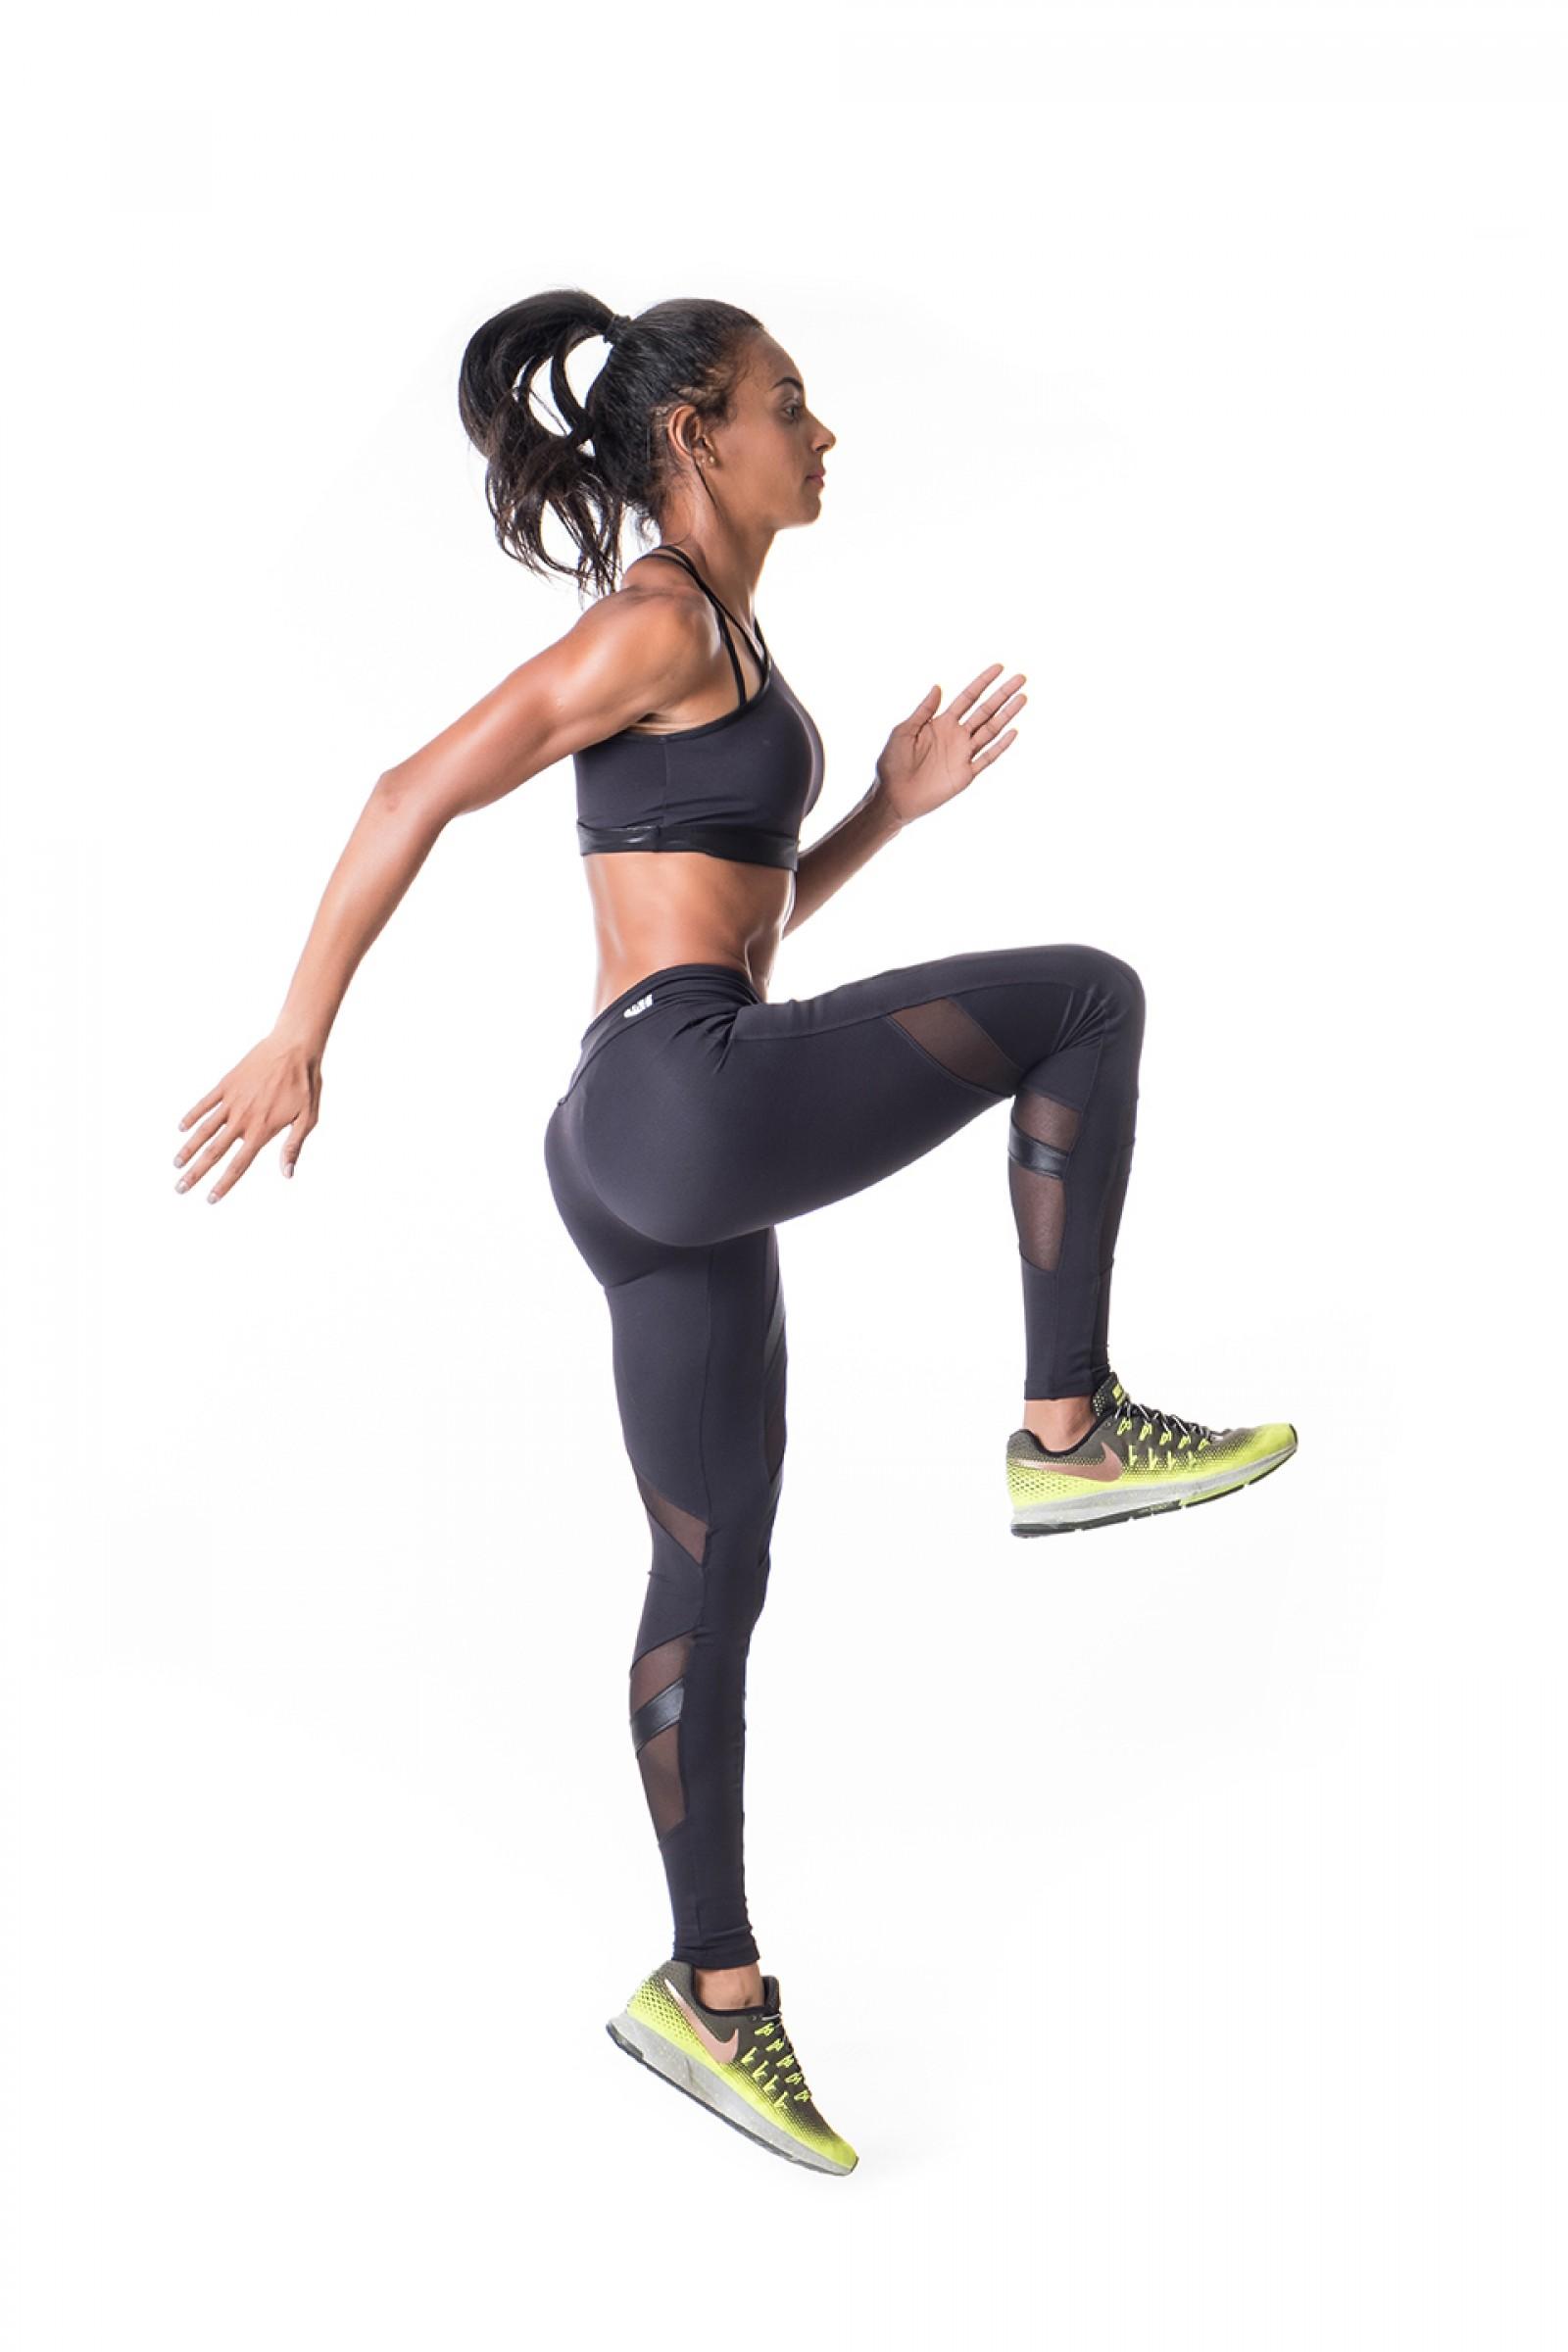 Legging Instigate Preto, Coleção Challenge - NKT Fitwear Moda Fitness